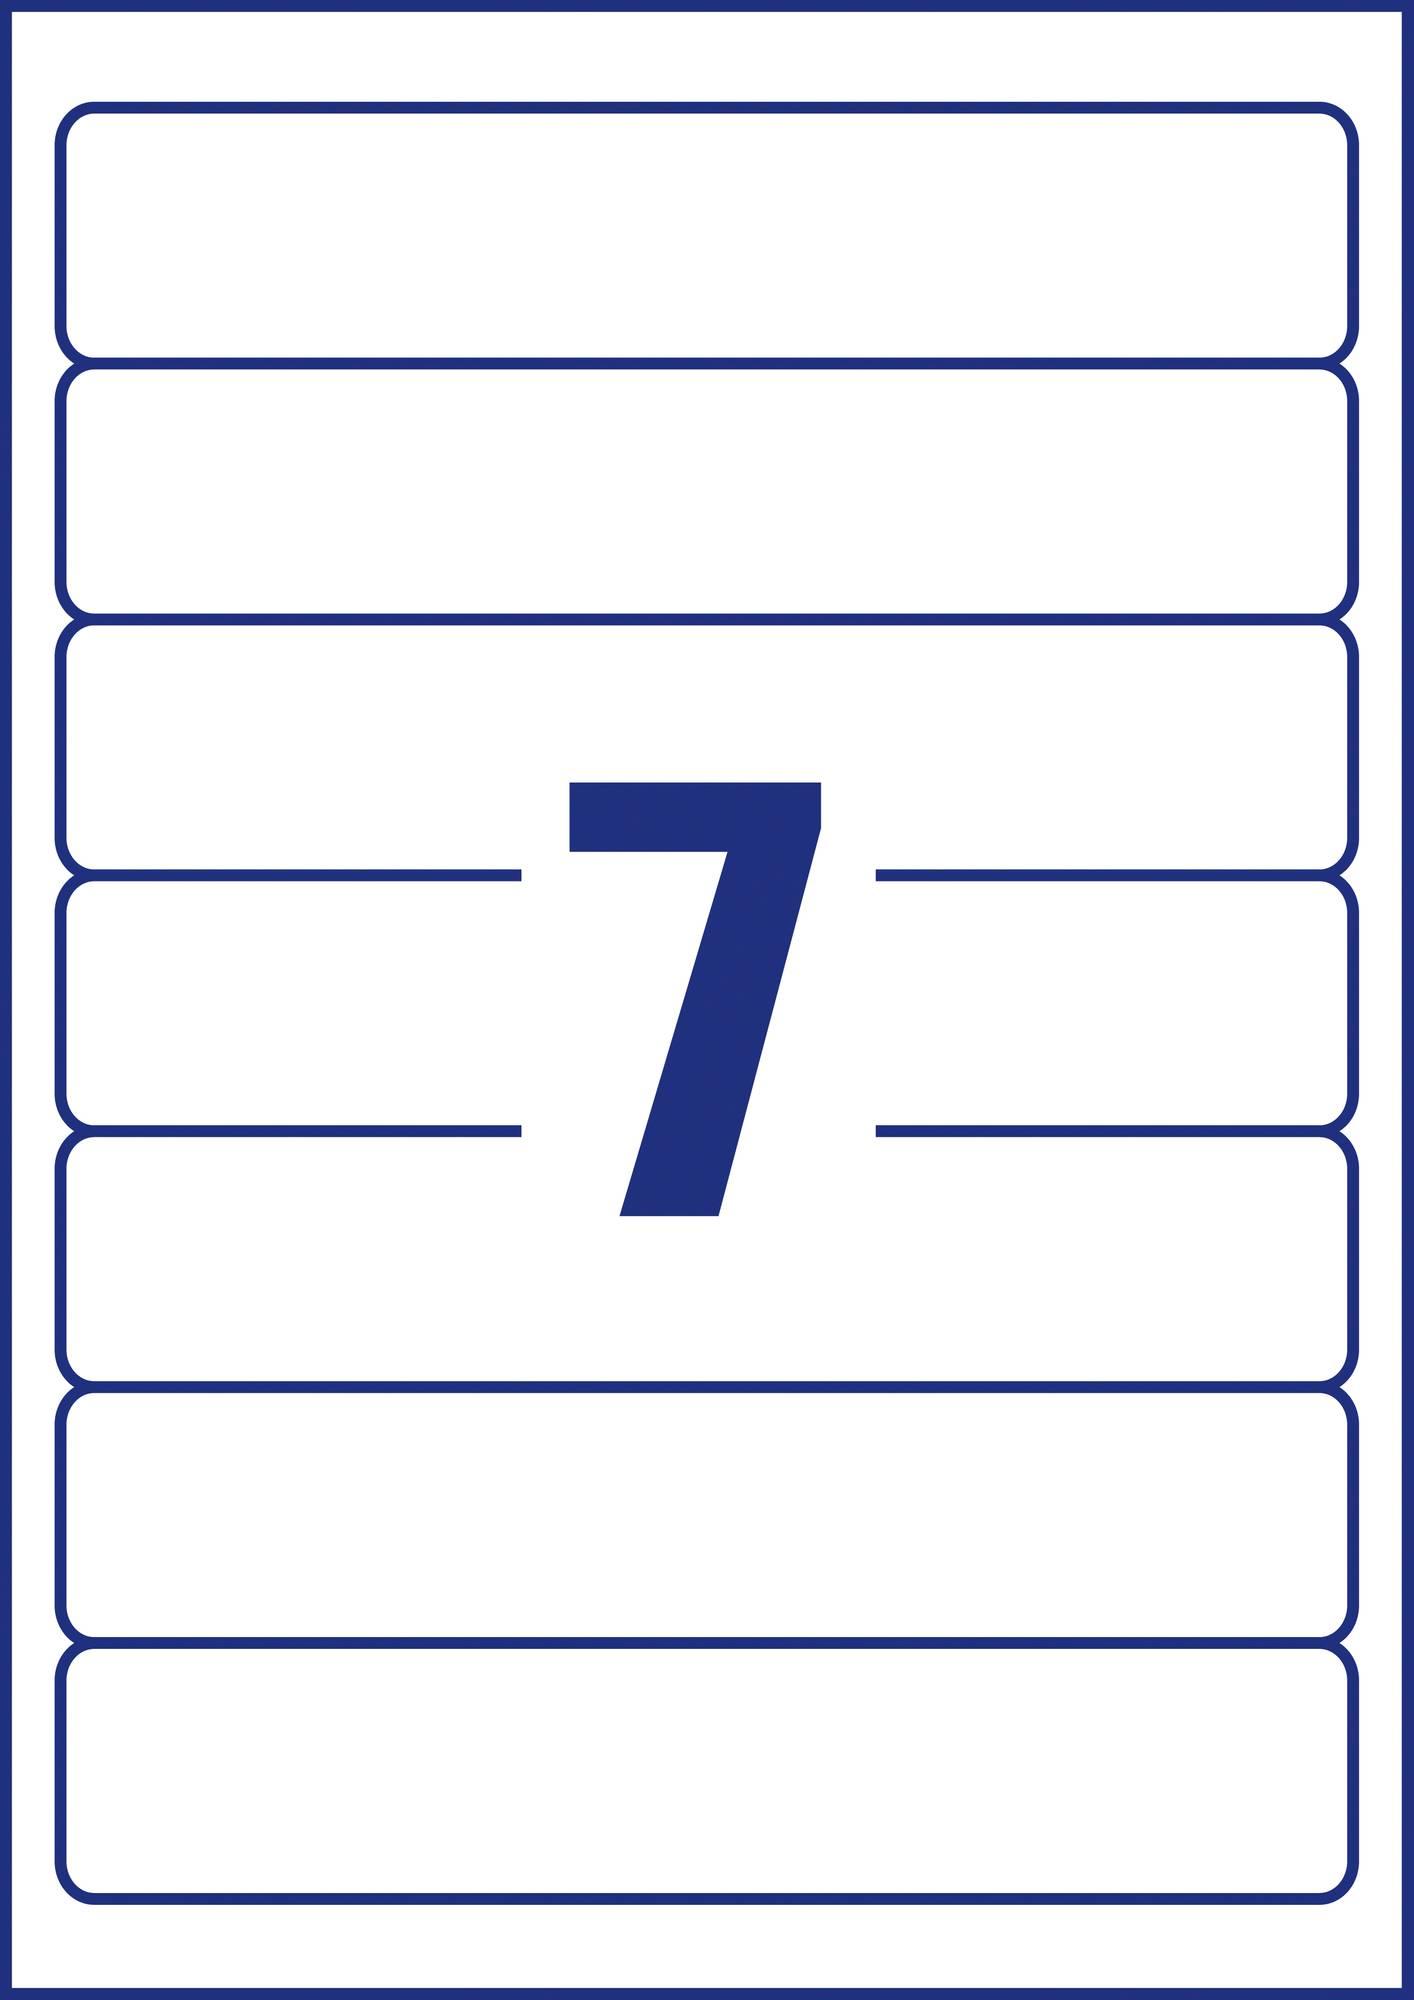 Weiße Avery Zweckform Ordneretiketten L4760REV-20, 38 x 192 mm, 7 Etiketten pro Blatt